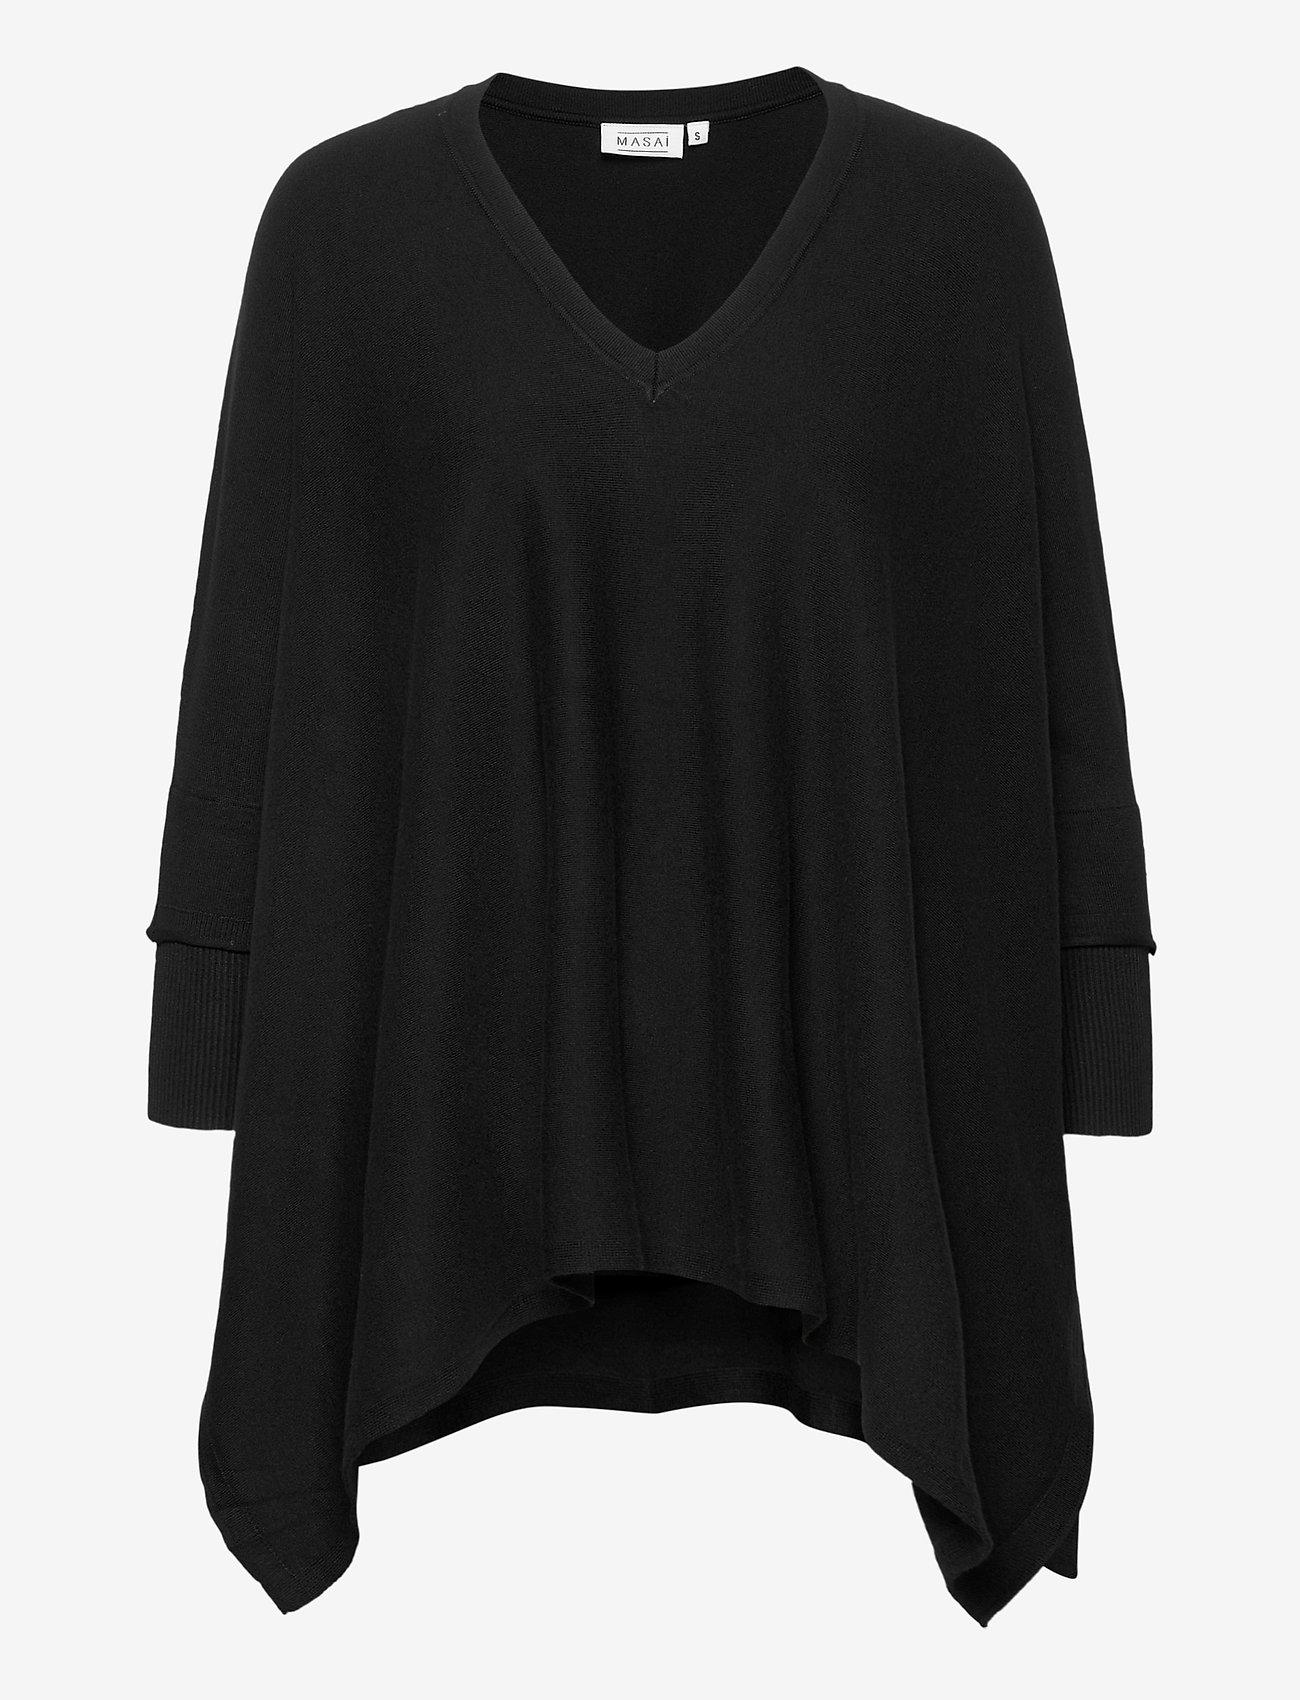 Masai - Fosna - swetry - black - 1